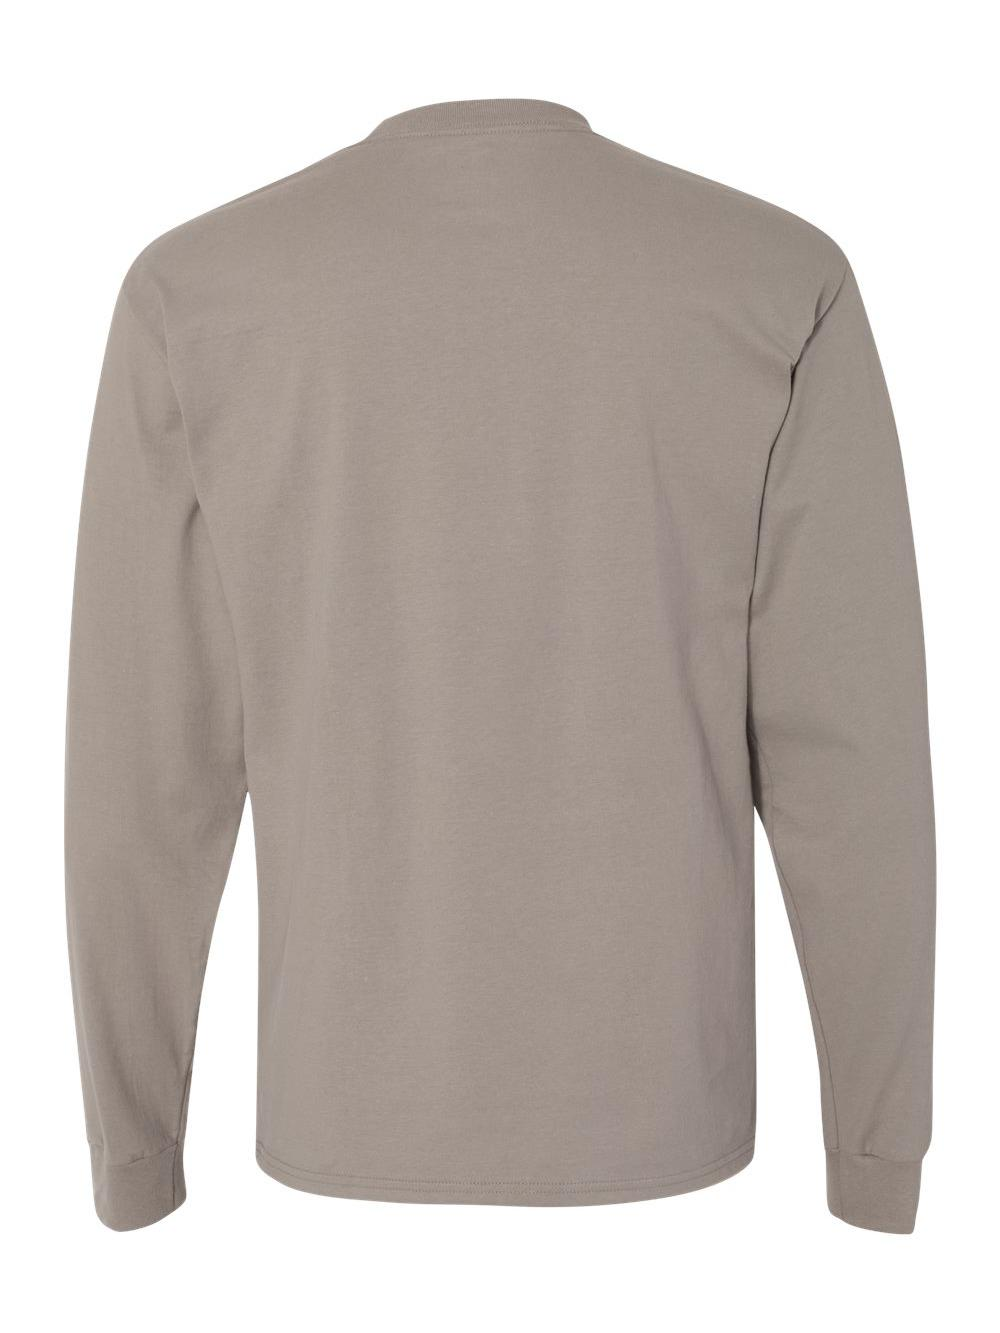 Hanes-Beefy-T-Long-Sleeve-T-Shirt-5186 thumbnail 52